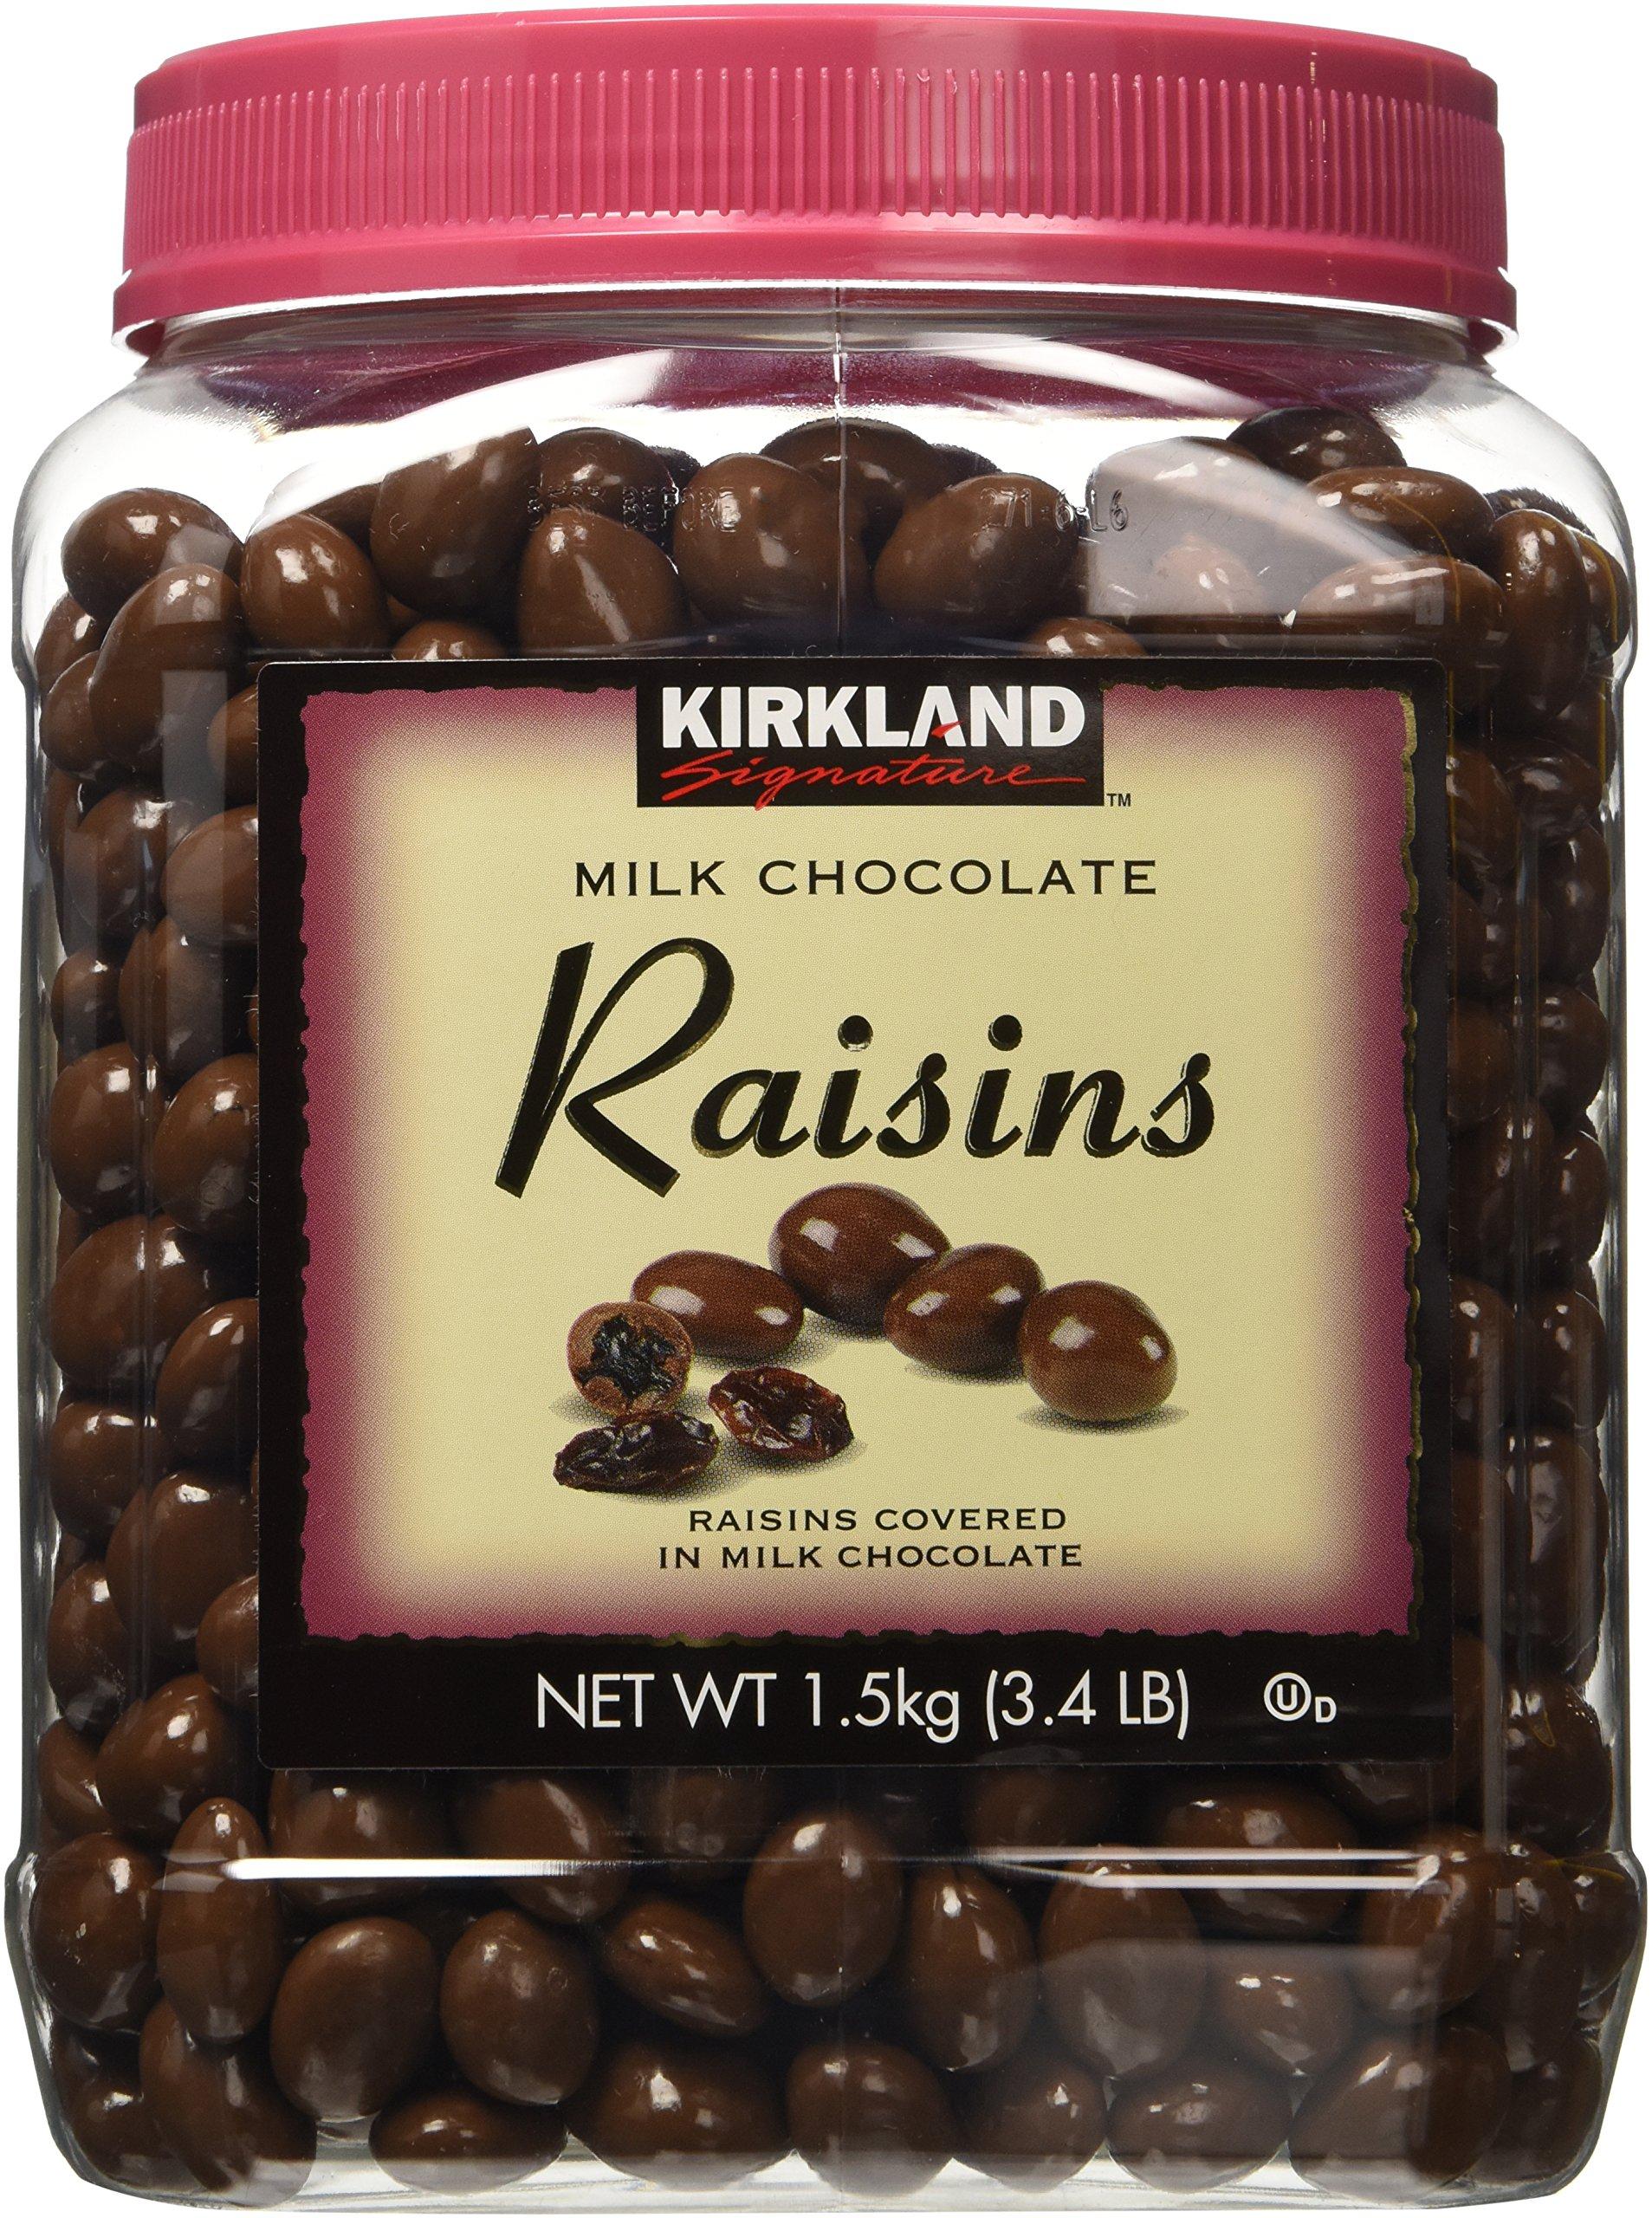 Kirkland Signature Milk Chocolate, Raisins, 54 Ounce x 2 (Pack of 2) by Kirkland Signature